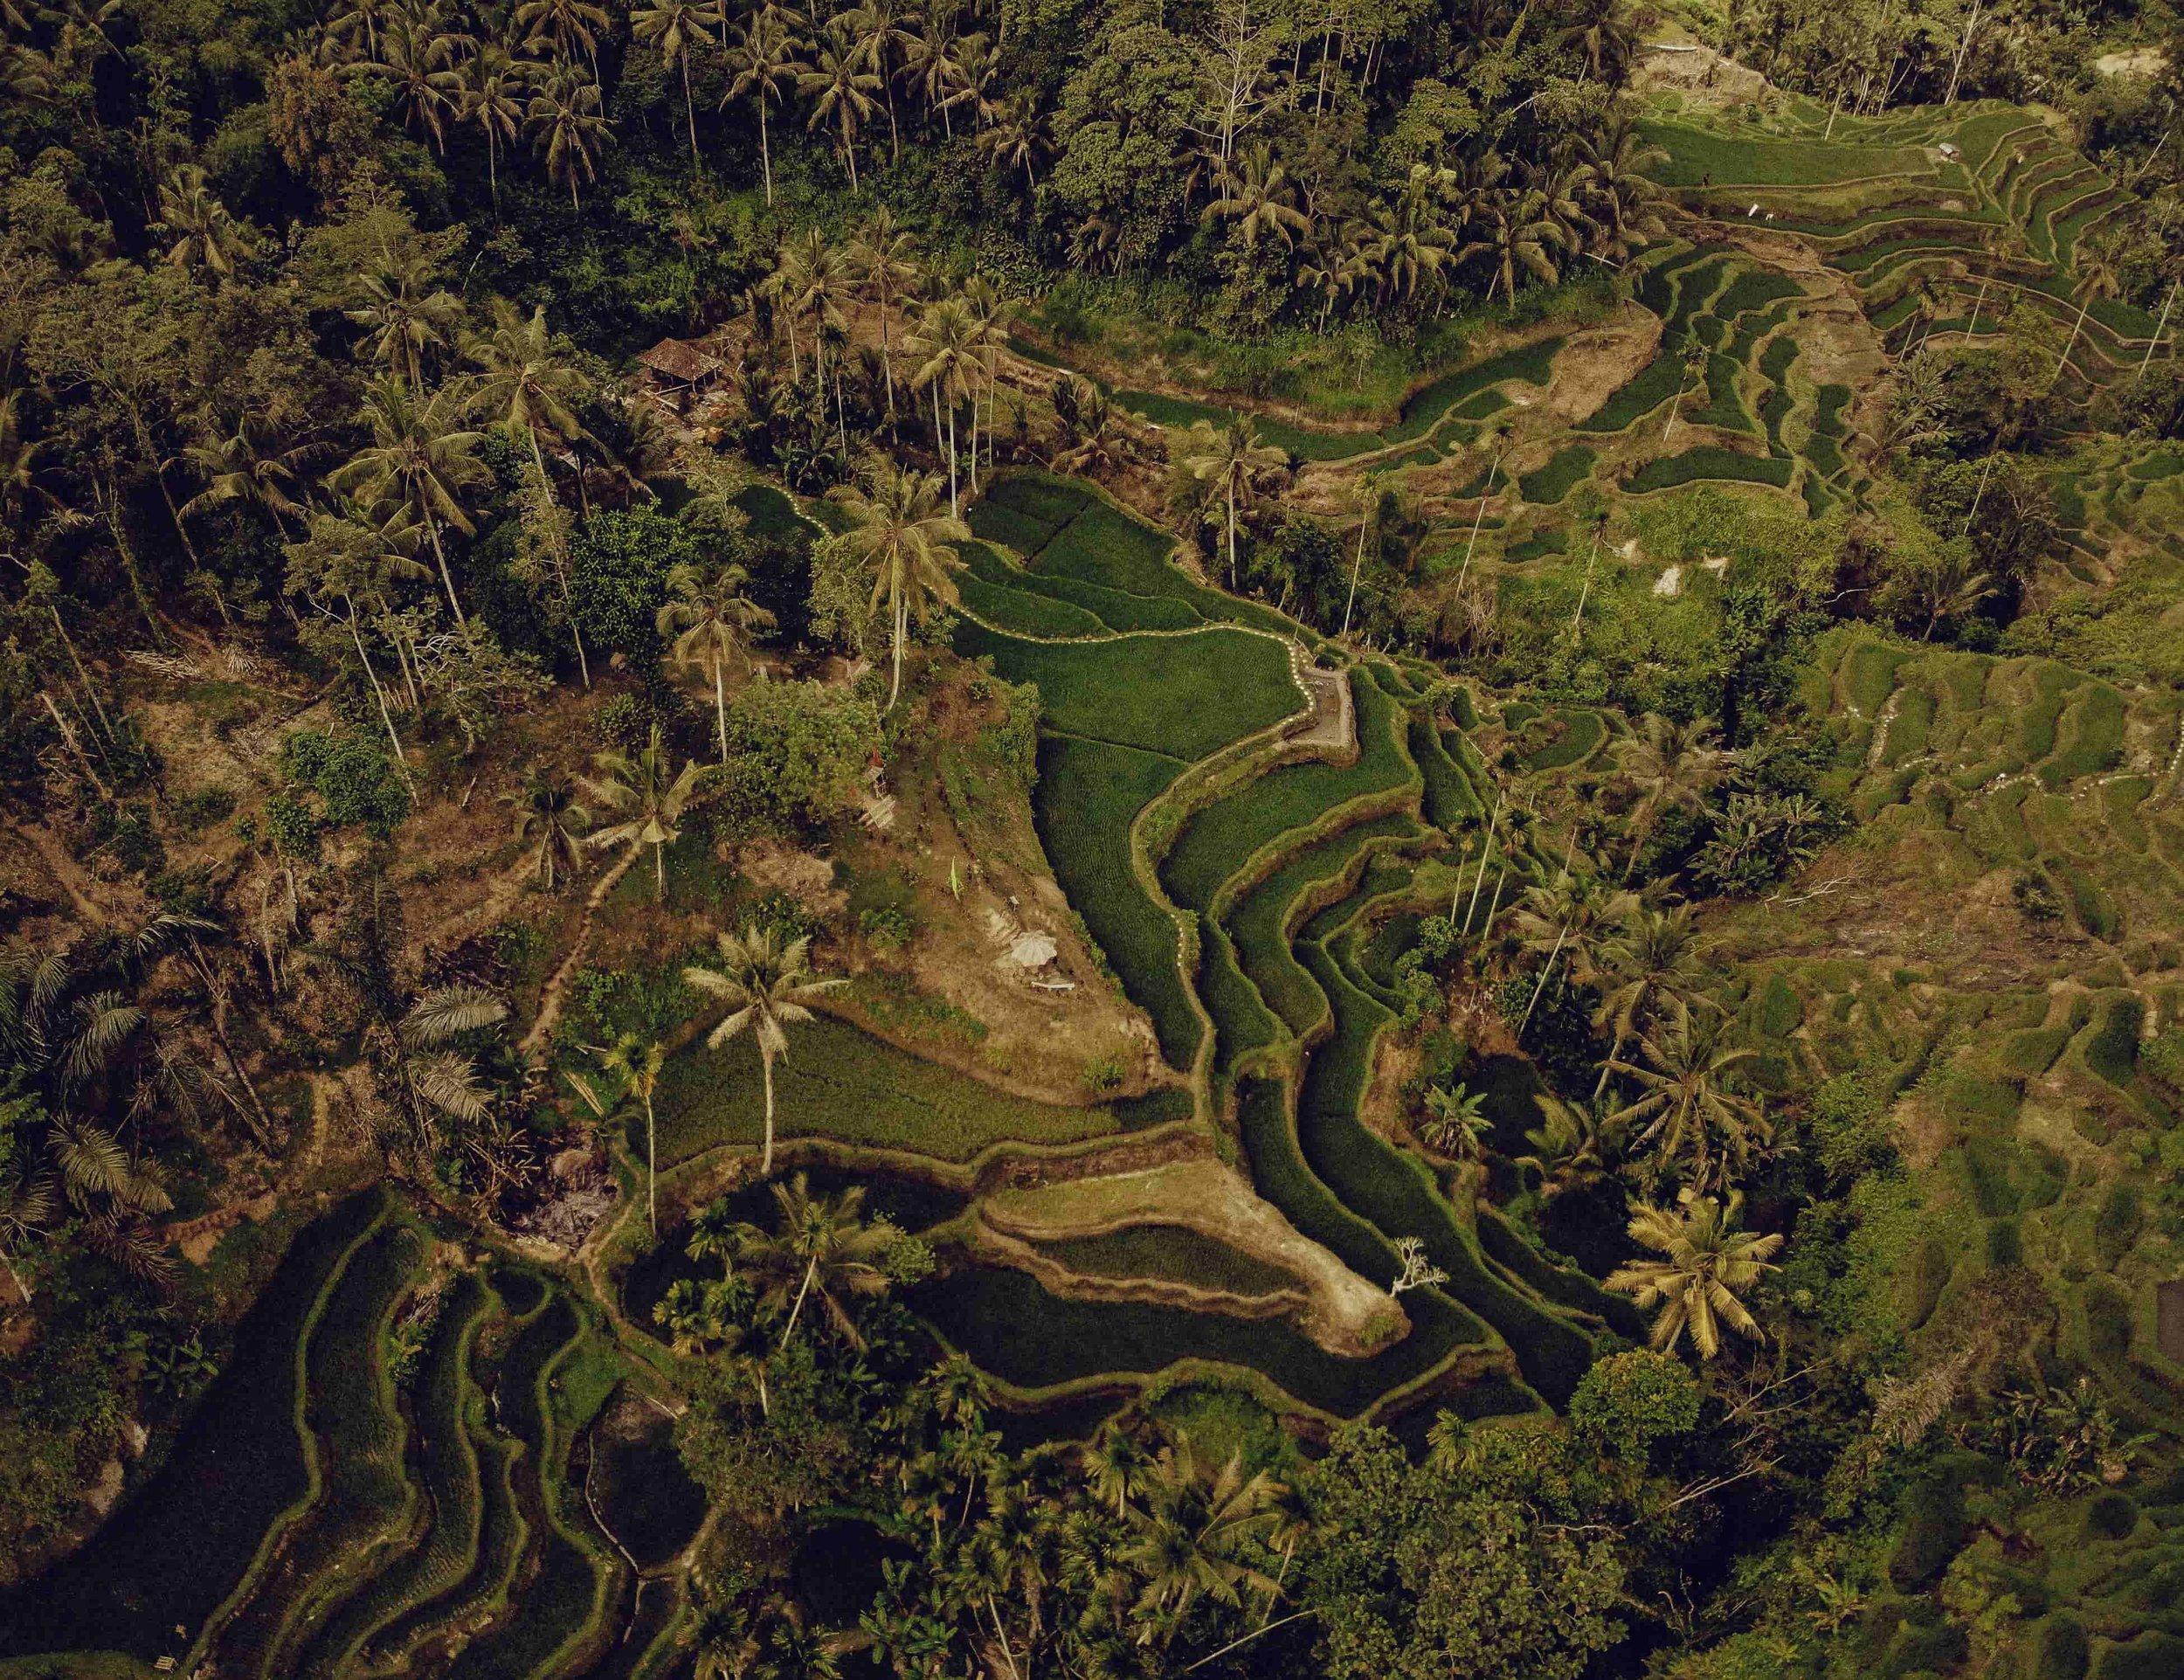 BaliRiceTerraces_LandscapePhotographyByMarcusMeisler.JPG